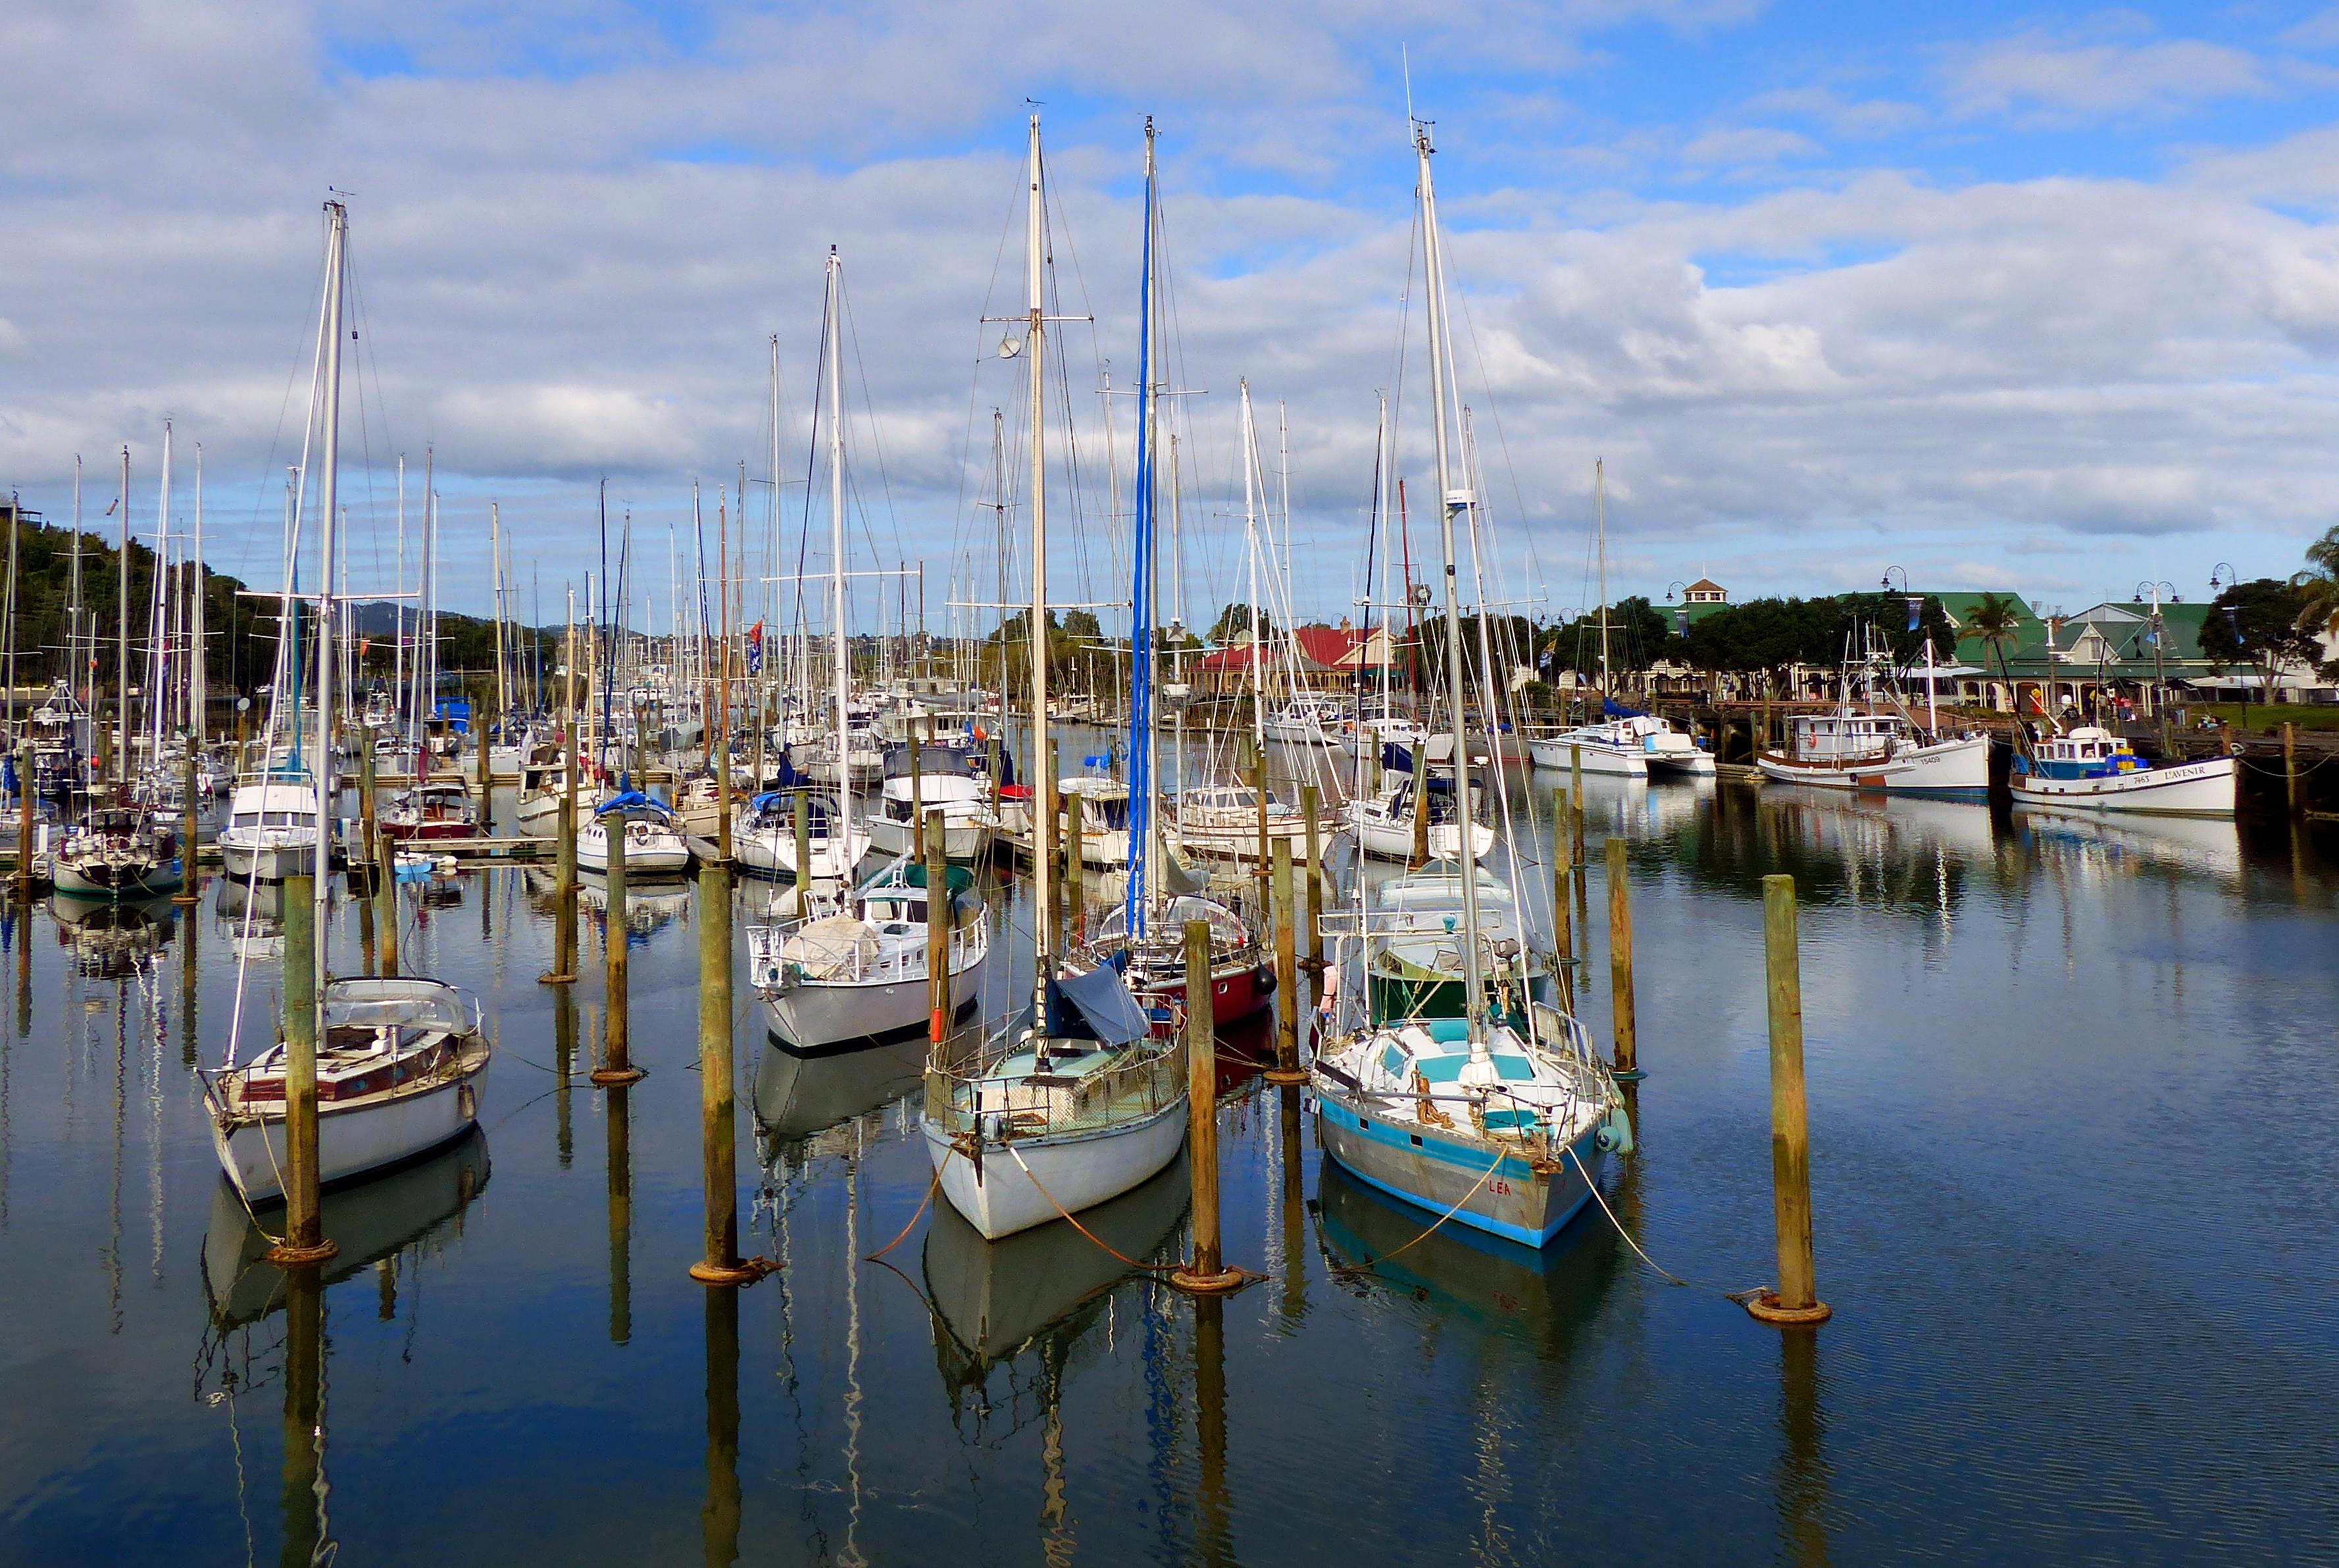 Boat Marina Whangarei. NZ, Boat, Free photos, Outdoor, Public Domain Dedication (CC0), HQ Photo